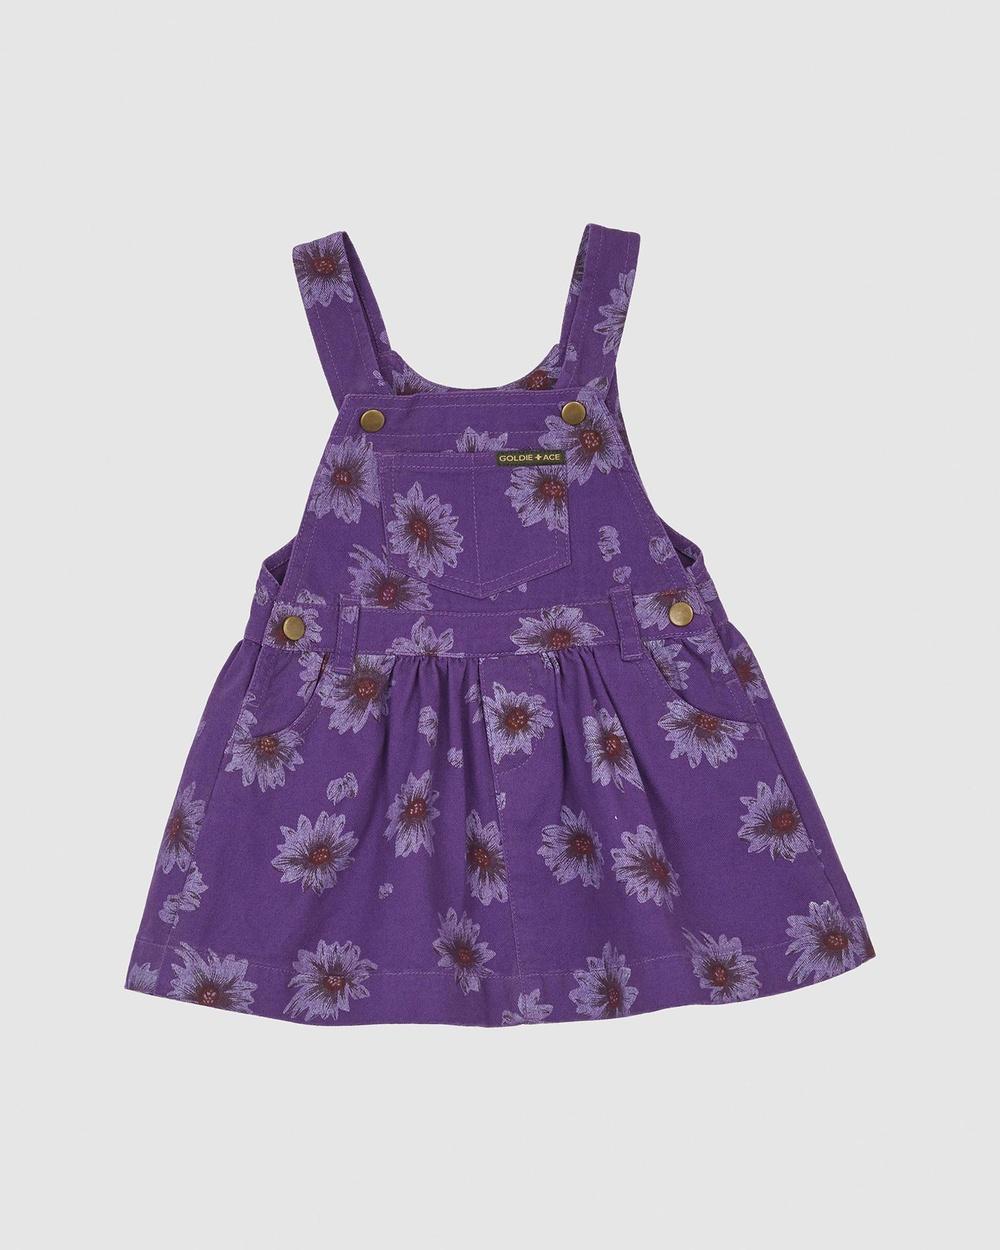 Goldie + Ace THE ICONIC EXCLUSIVE Vintage Wash Daisies Denim Dress Babies Kids Printed Dresses Purple Babies-Kids Australia